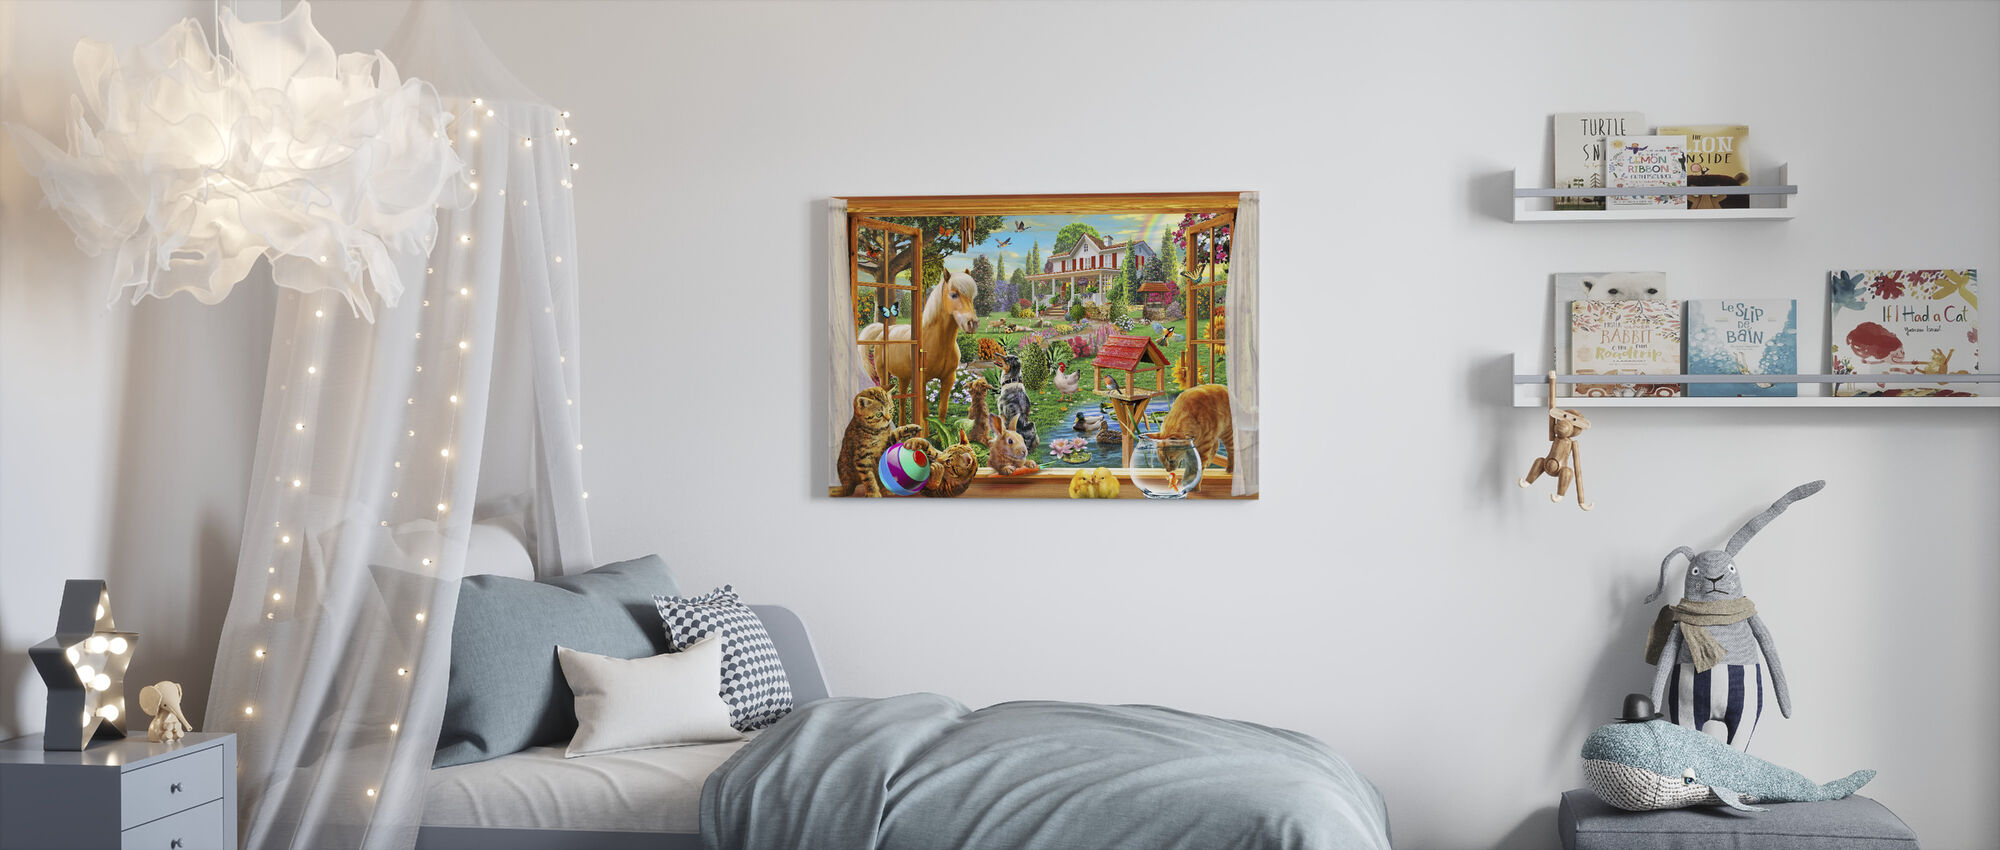 Animals in the garden - Canvas print - Kids Room